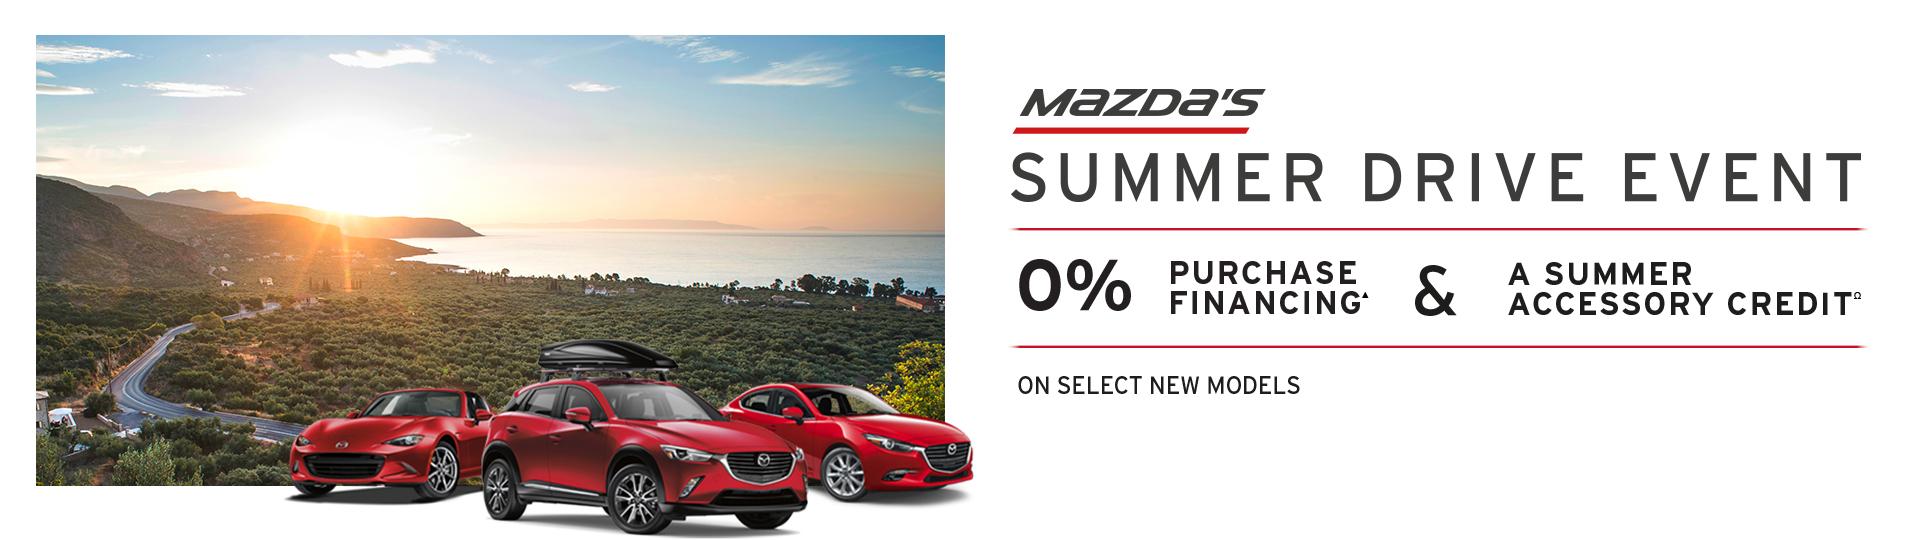 Mazda's Summer Drive Event